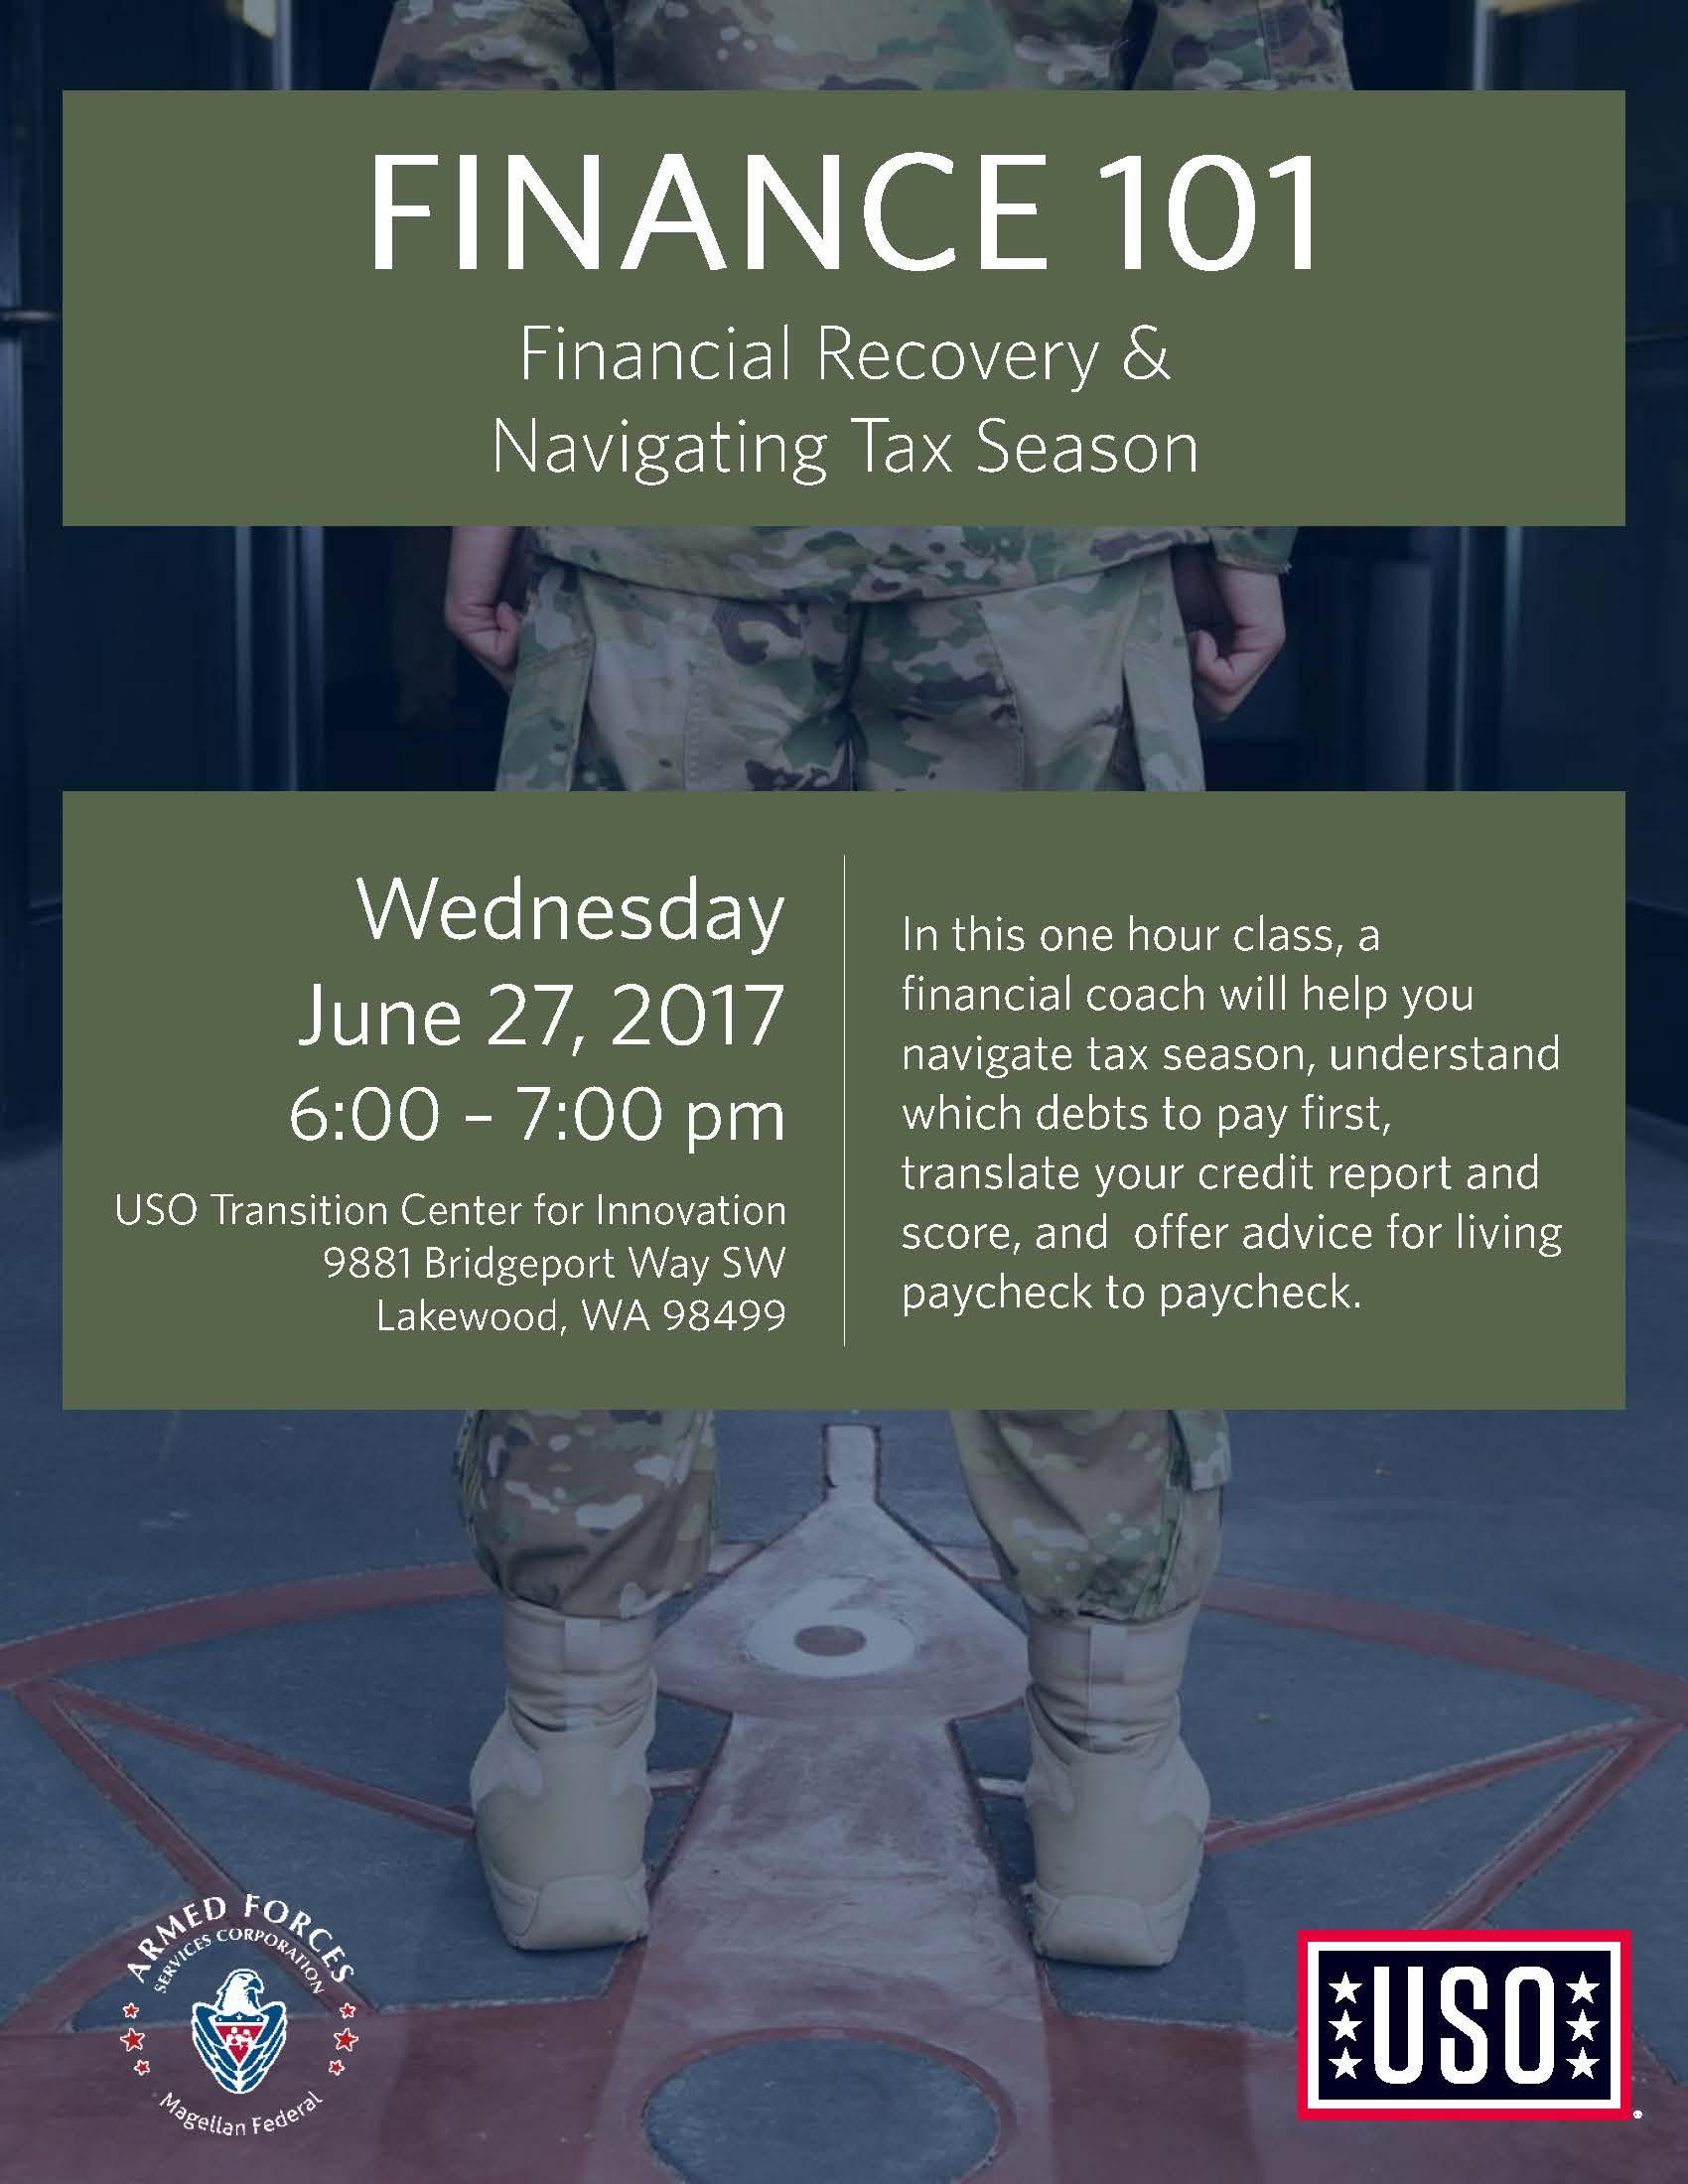 2017-06-27 Finance 101 NO LINK